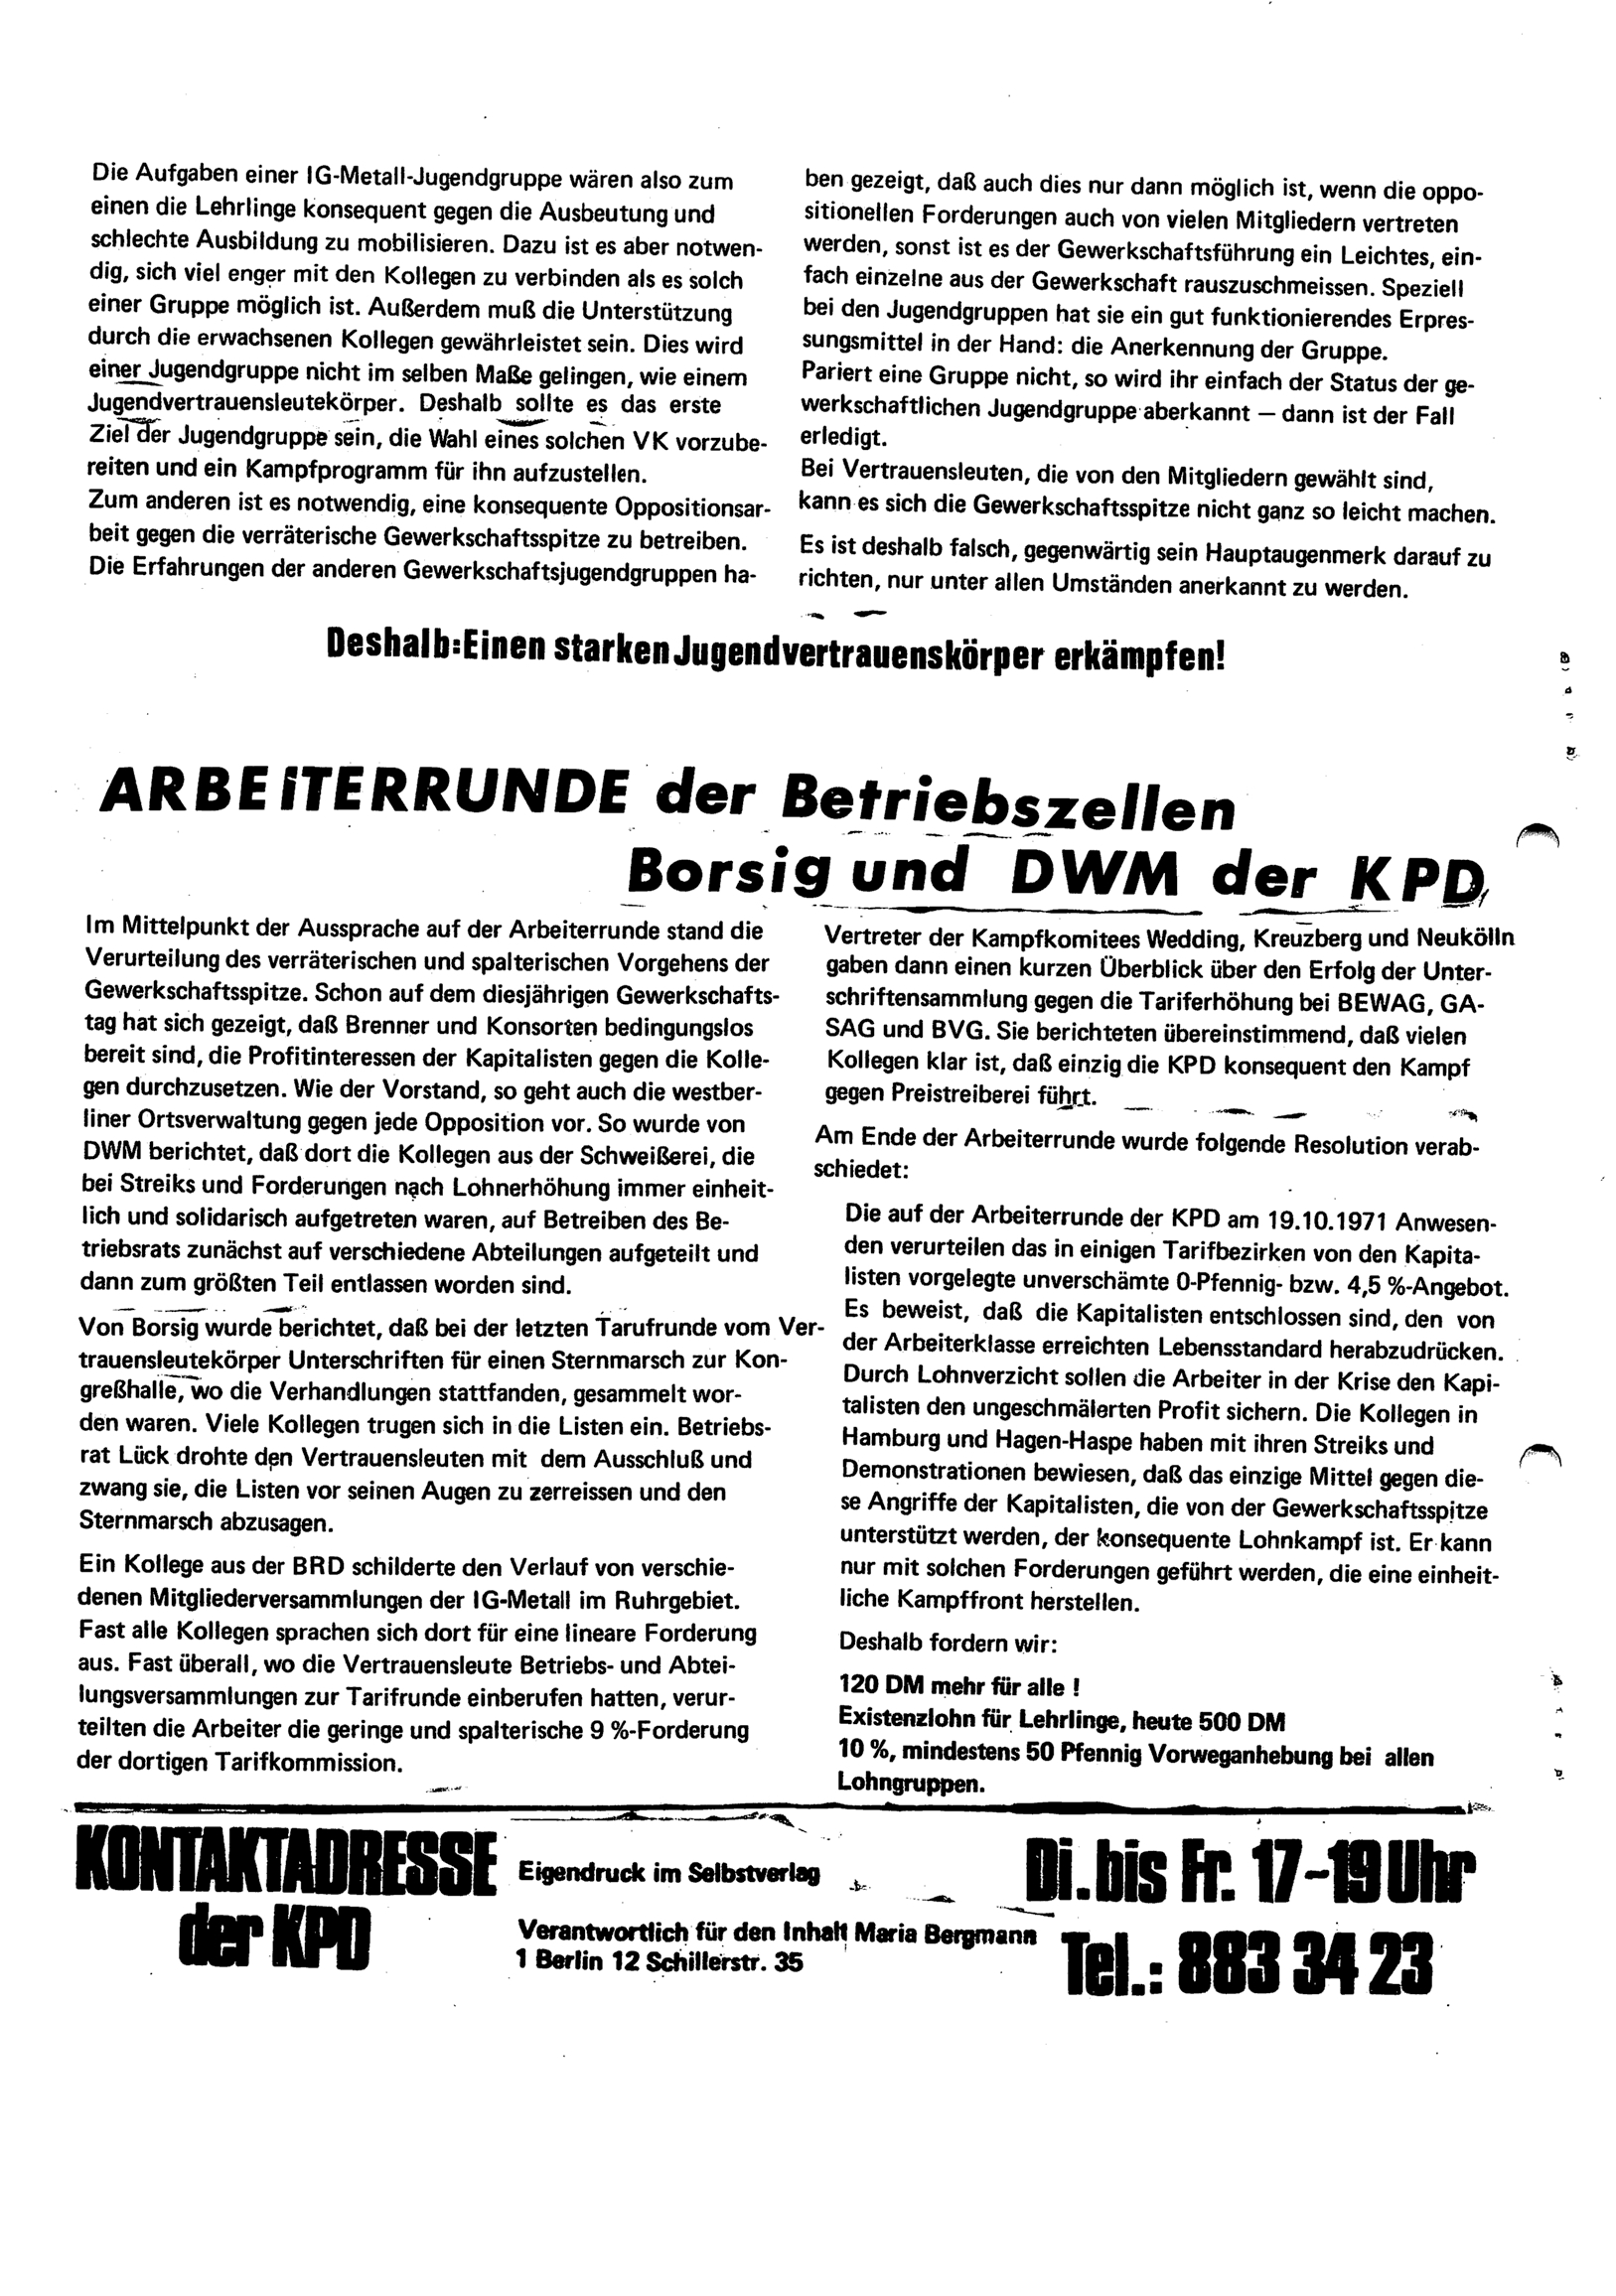 Berlin_Borsig323